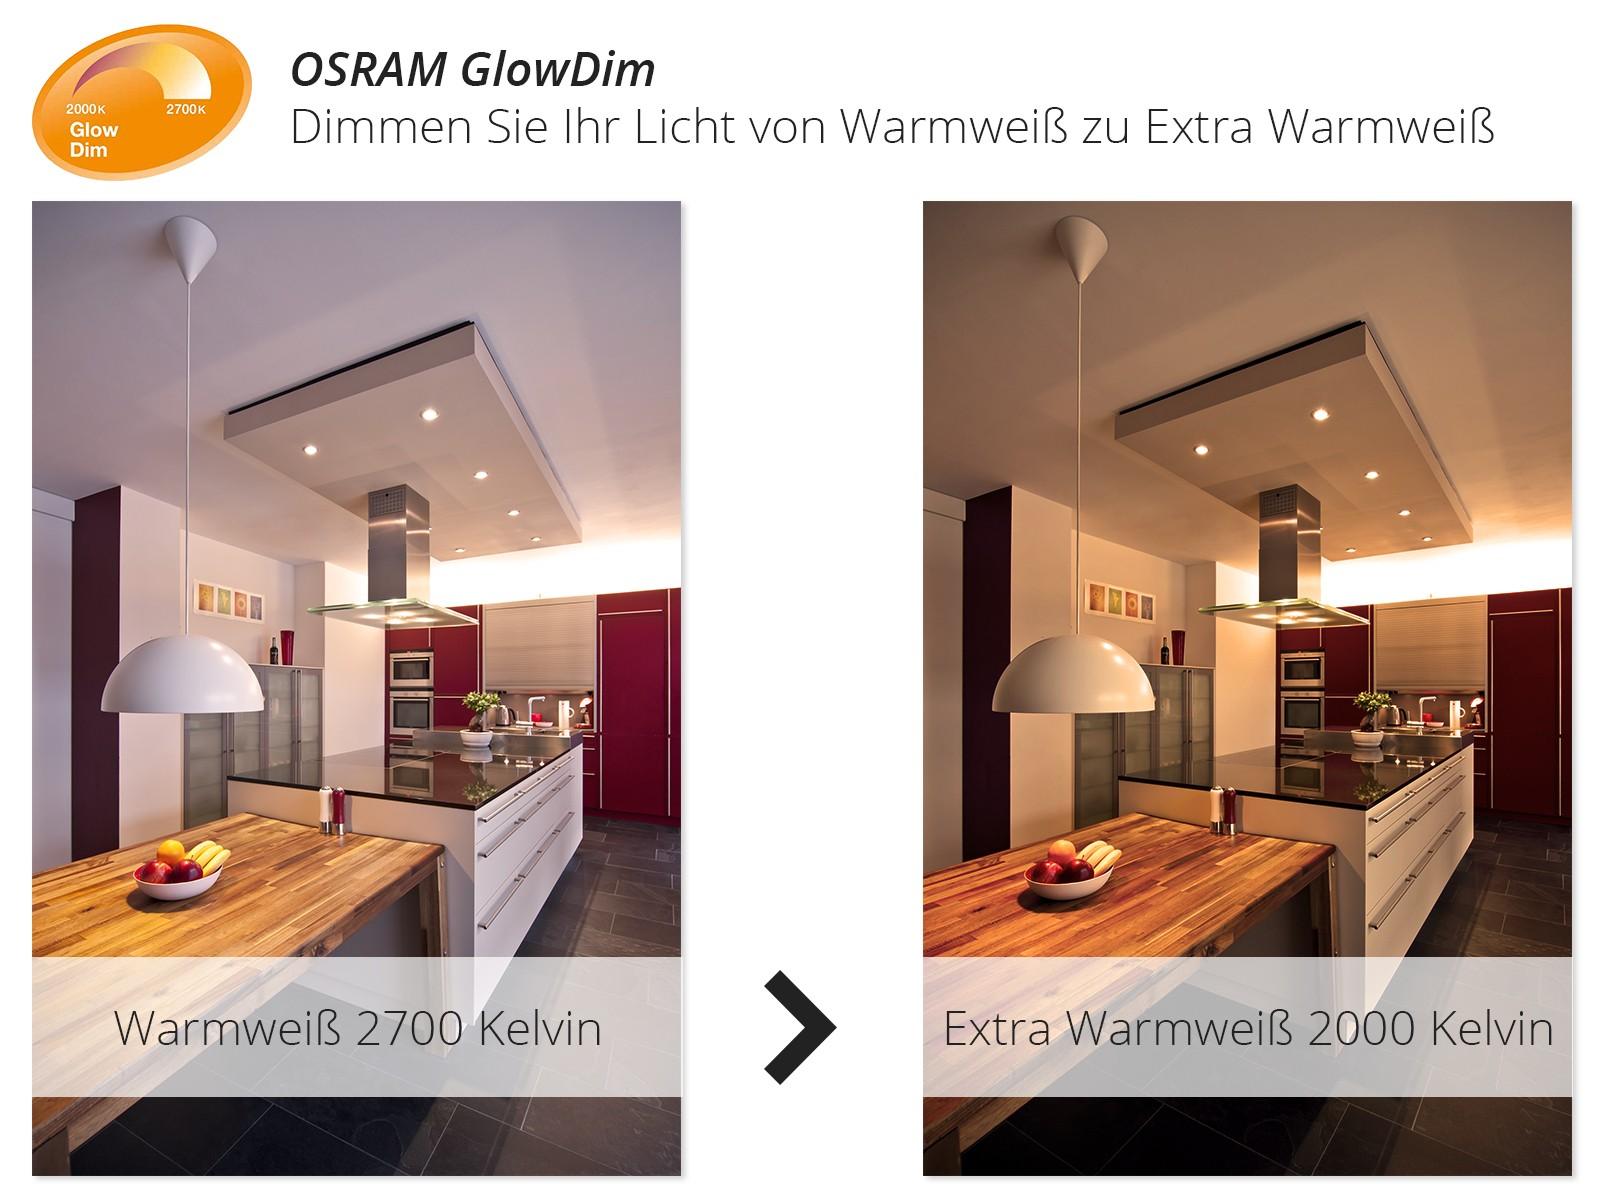 QW-1 Feuchtraum LED-Einbauspot Bad Dusche chrom, IP65 5,5W LED extra ...